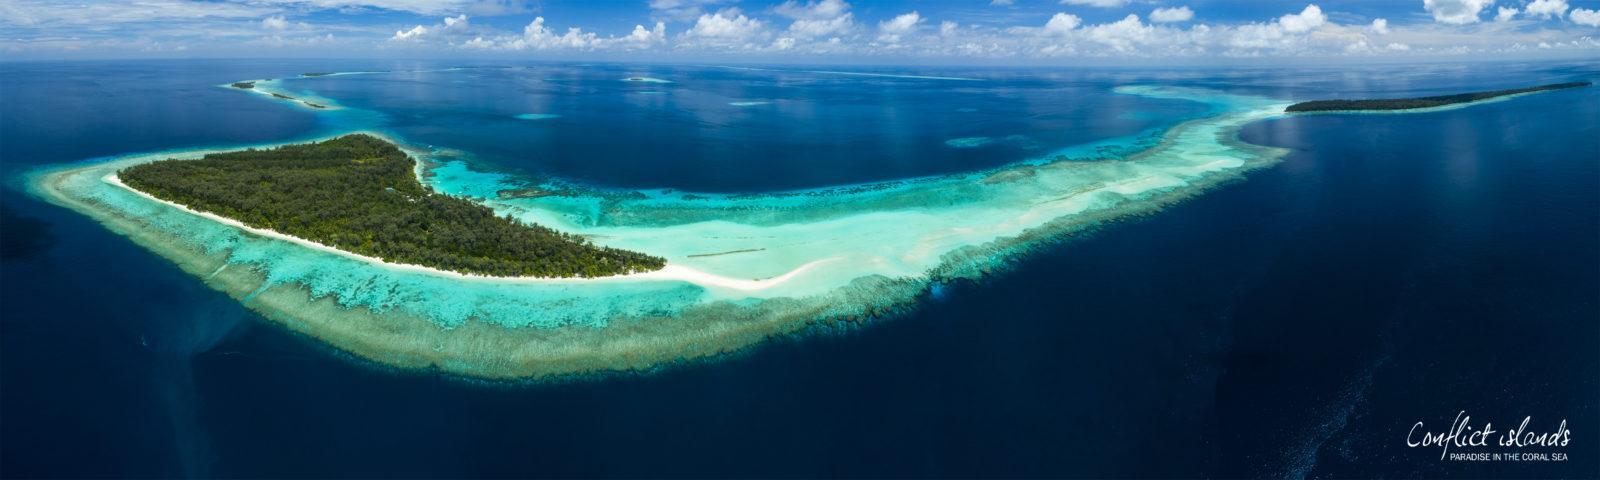 Conflict Islands Aerial Panorama